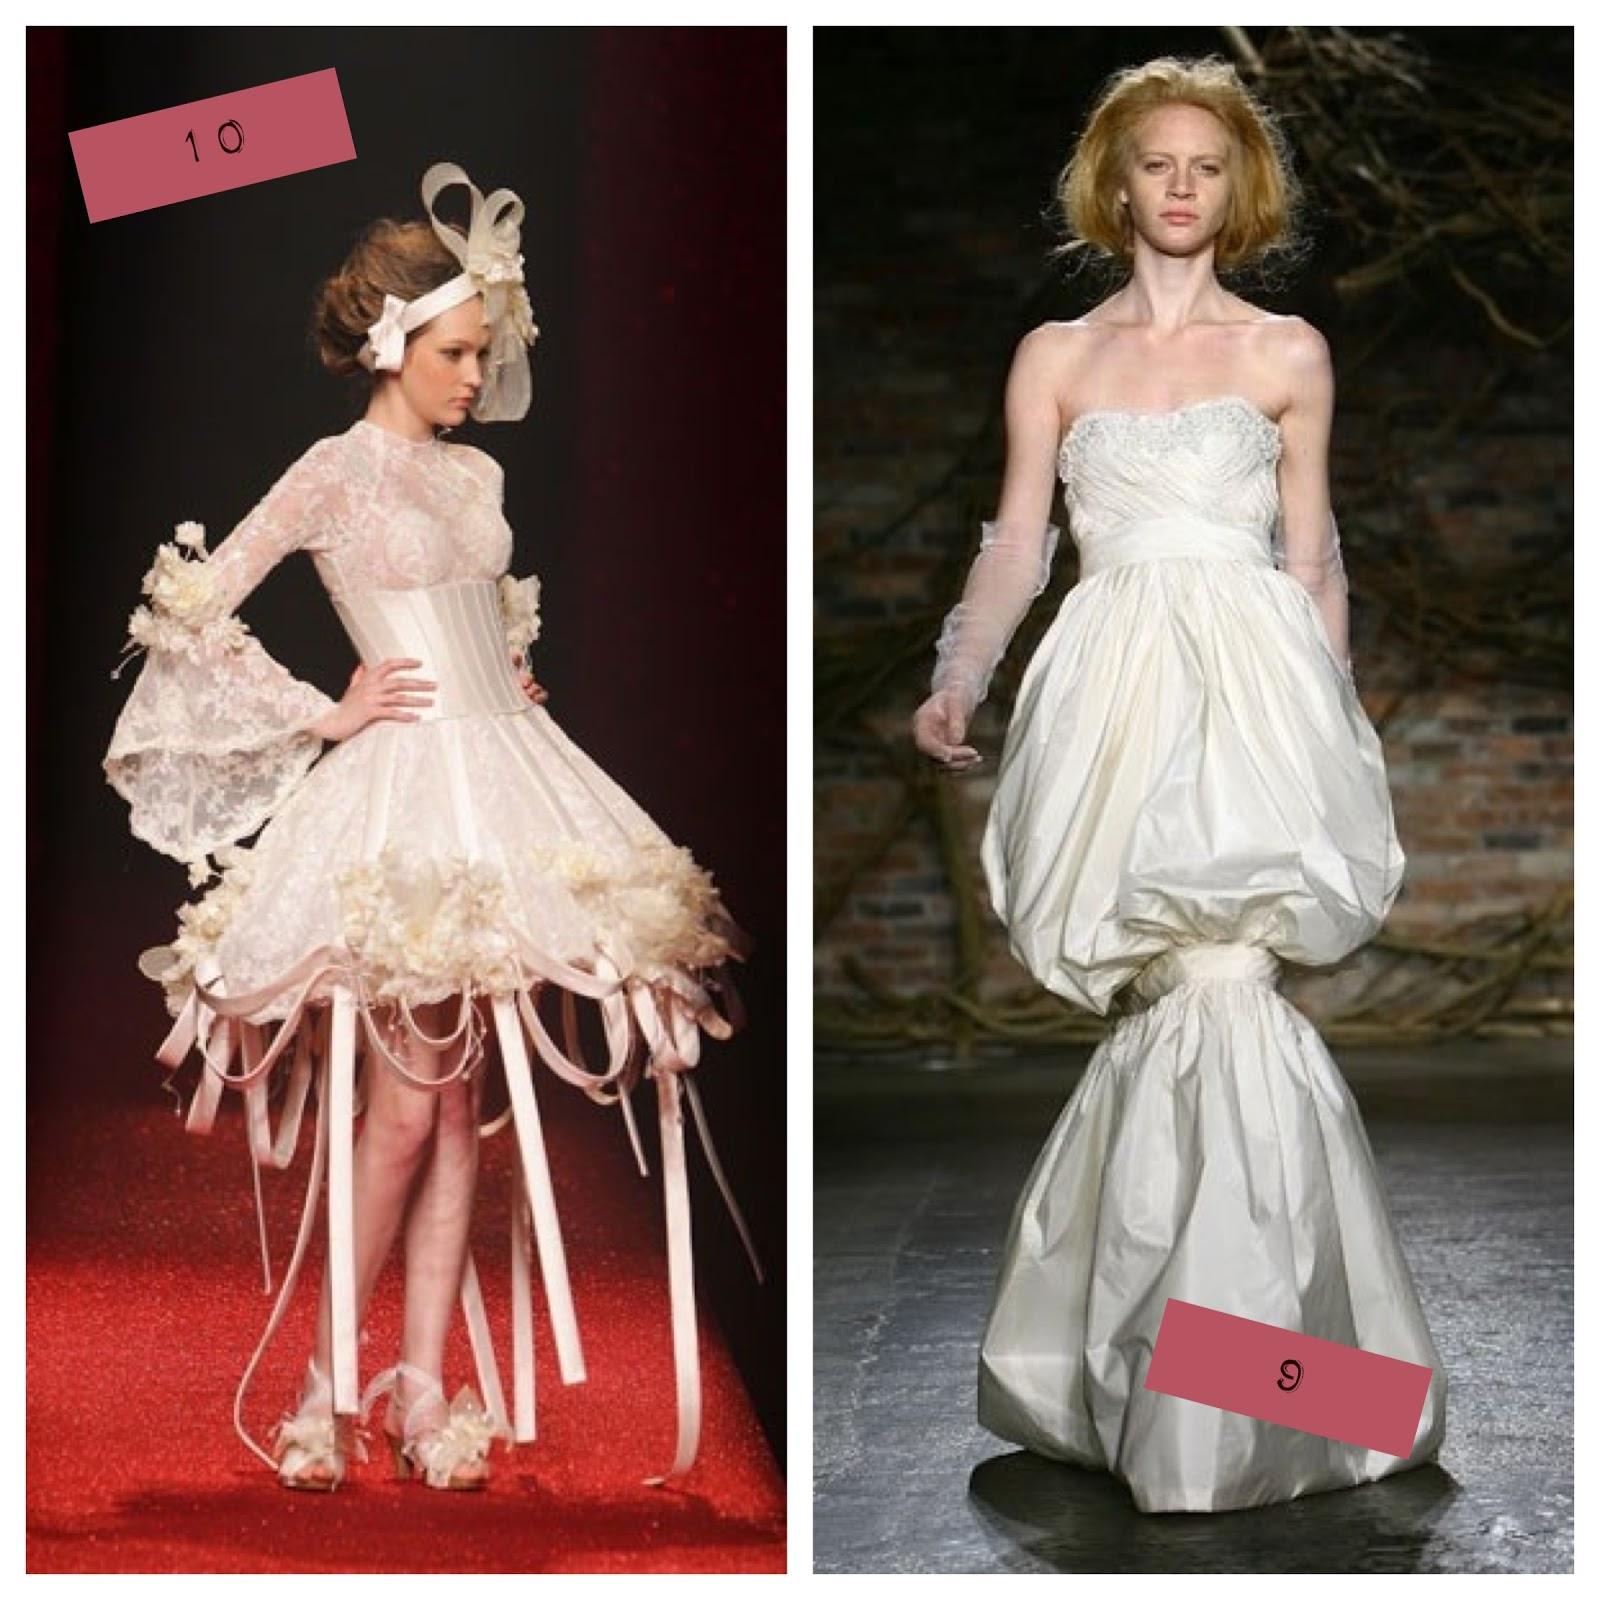 Tacky wedding dresses